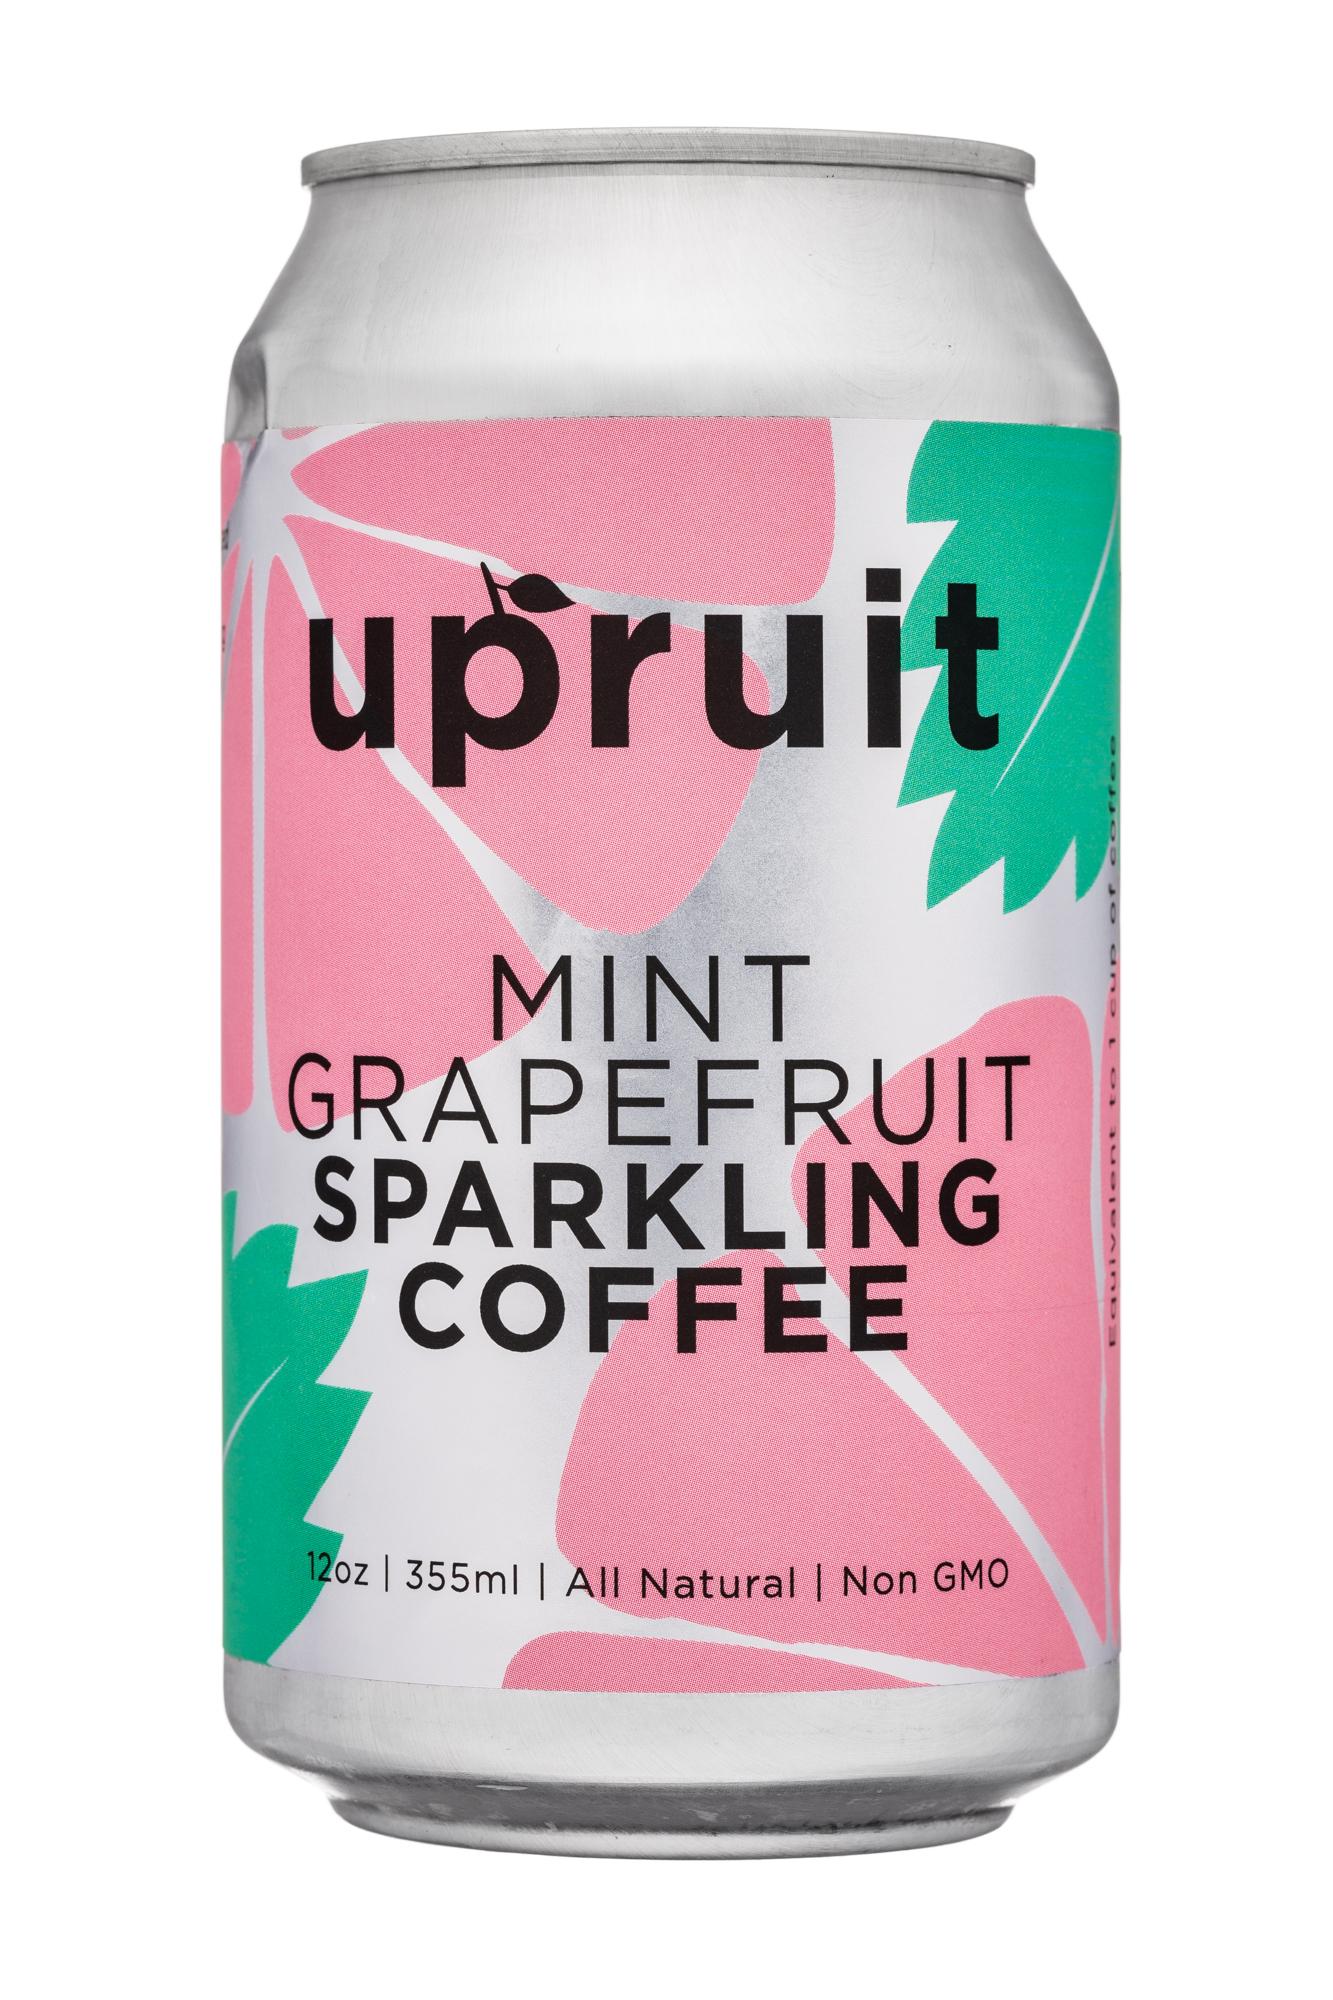 Upruit: Upruit-12oz-SparklingCoffee-MintGrapefruit-Front